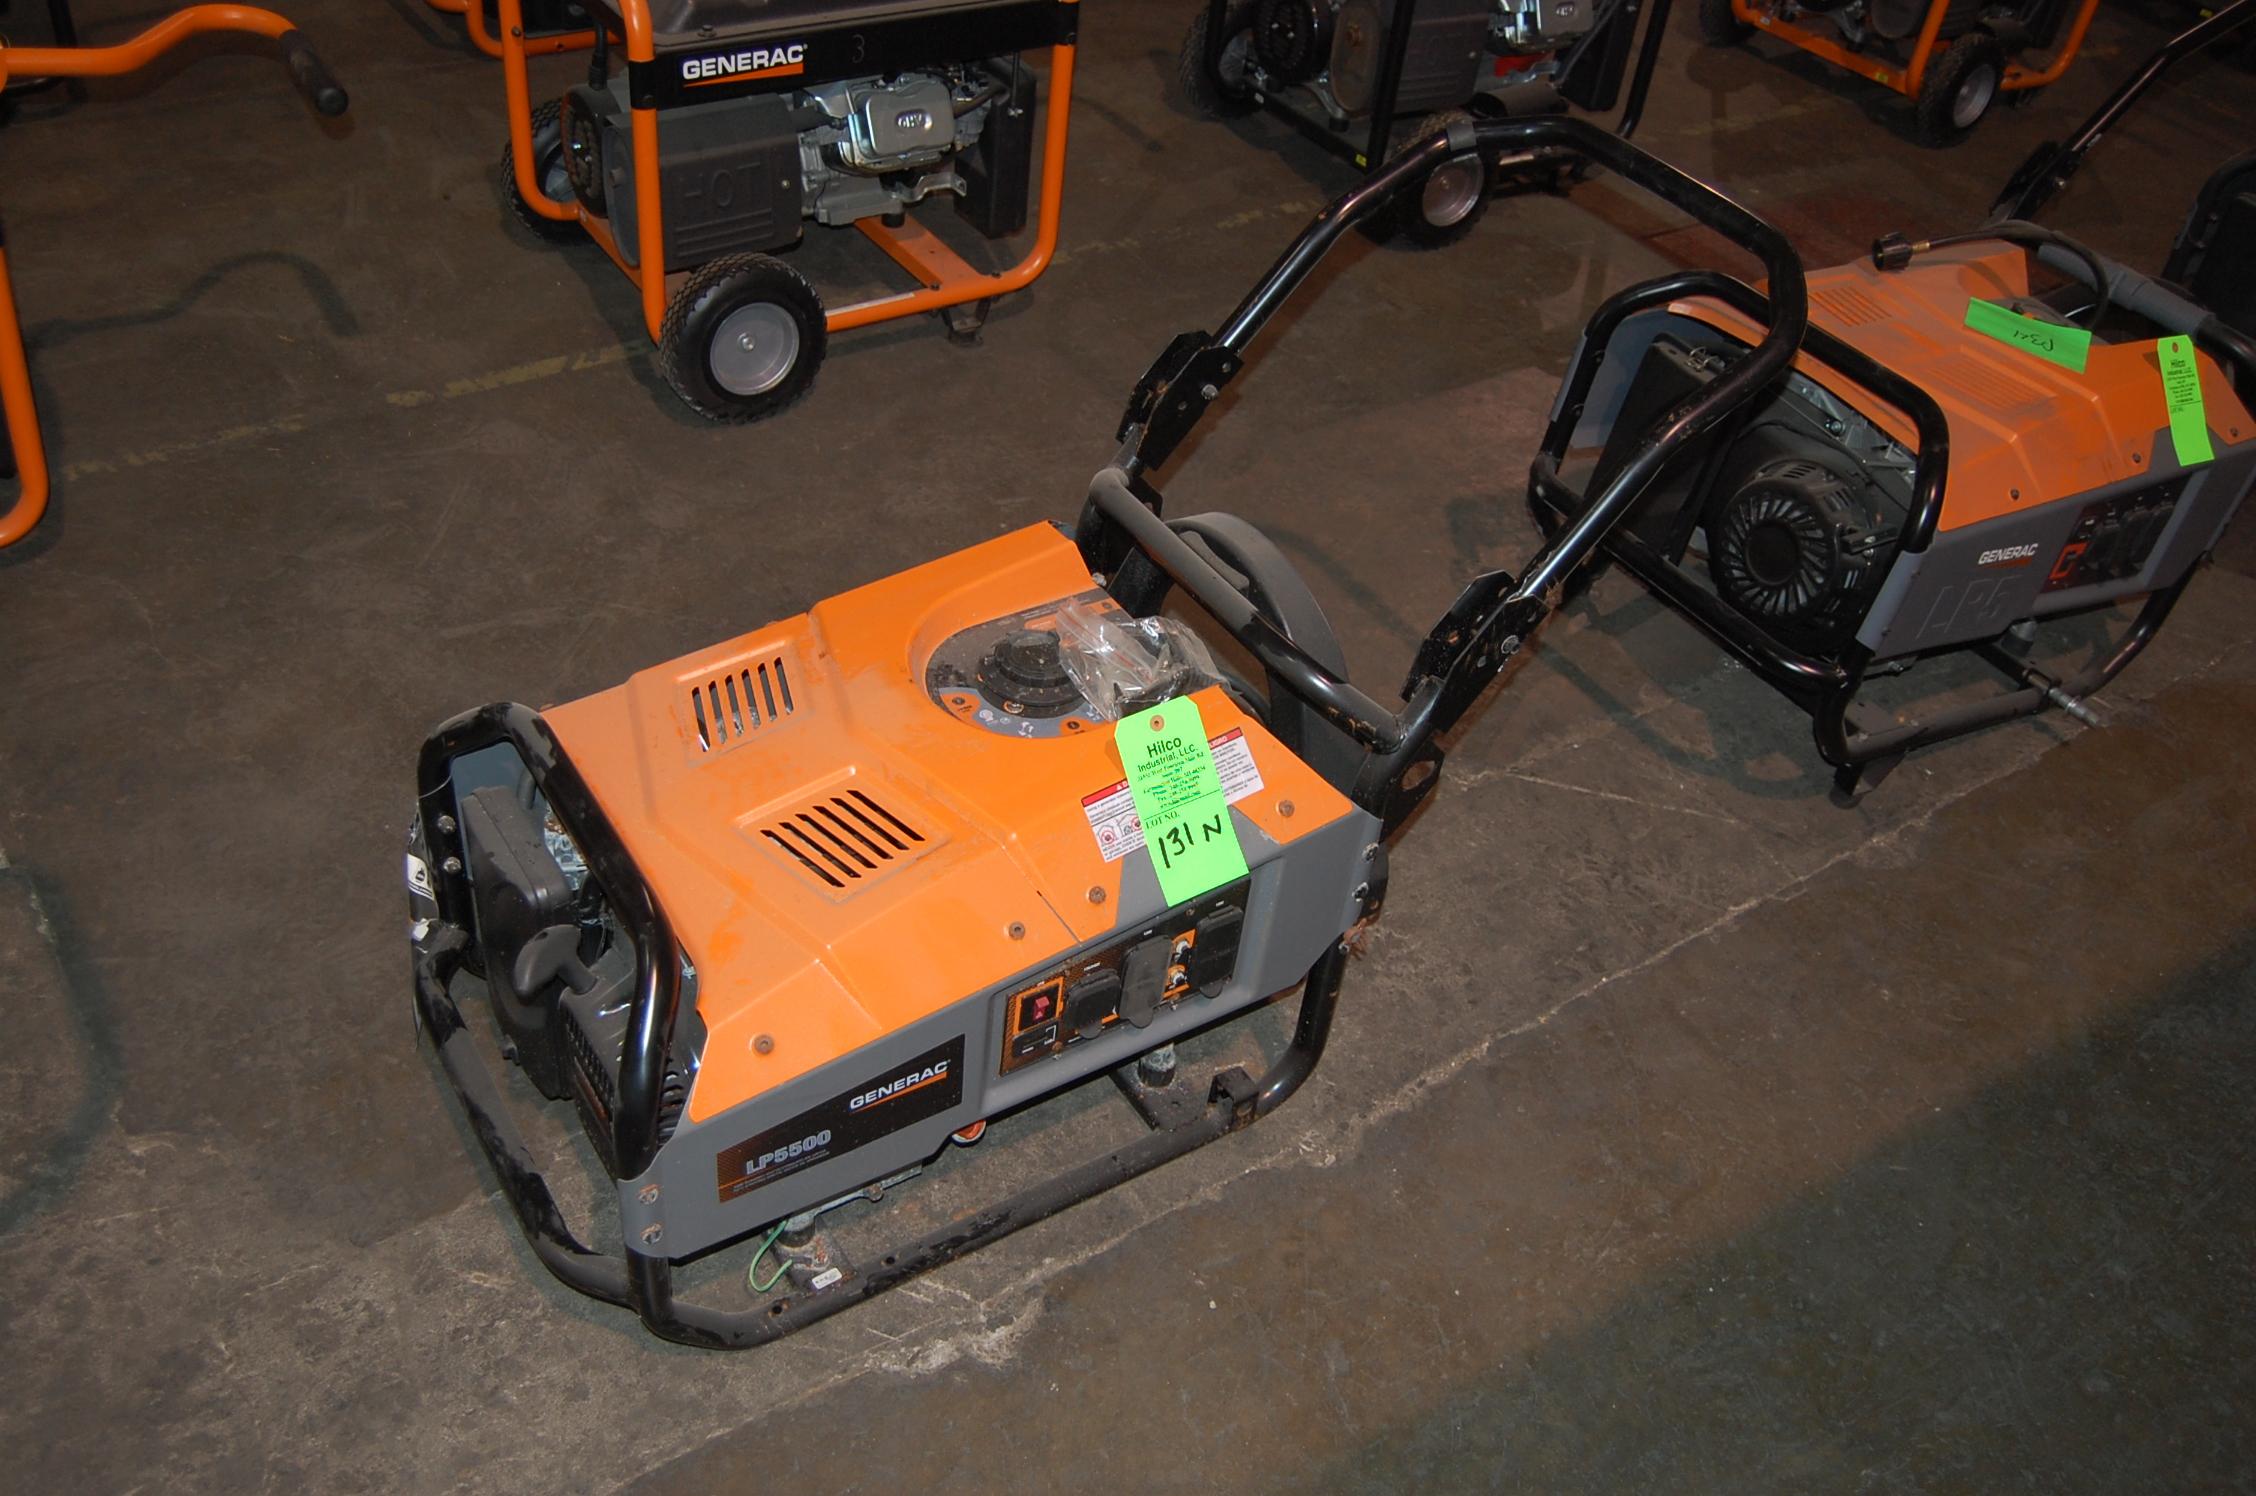 Generac Series LP5500 Model 6001 0 5 500 Watt Portable LP Gas